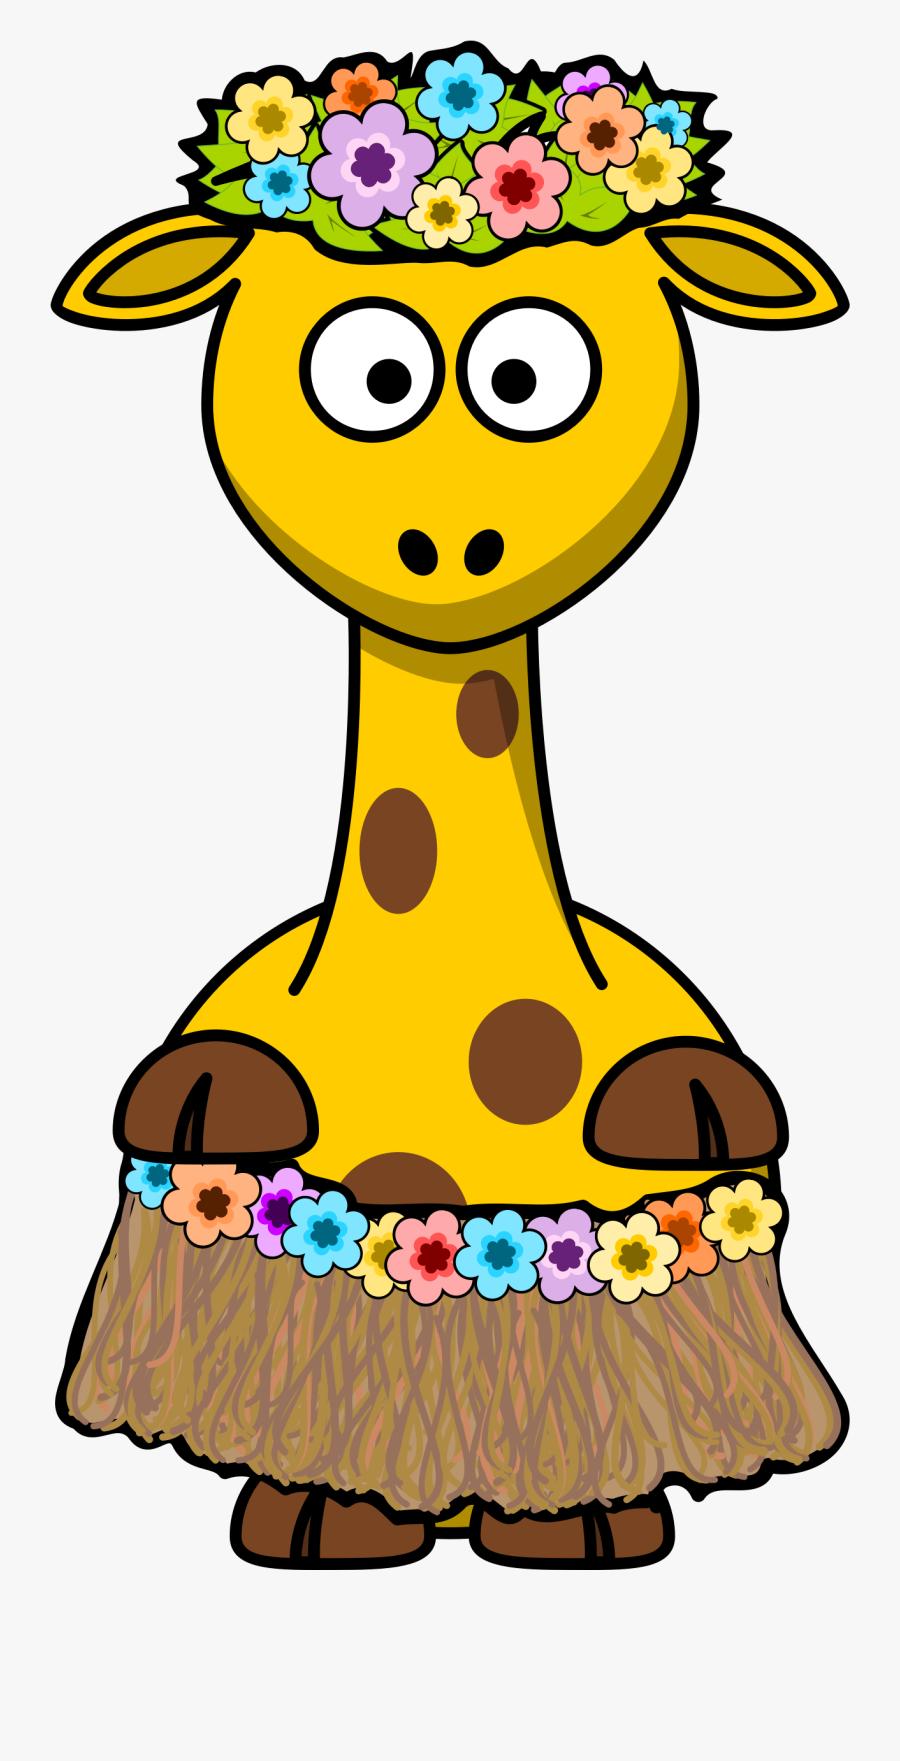 2013 December Colouringbook - Cartoon Giraffe, Transparent Clipart